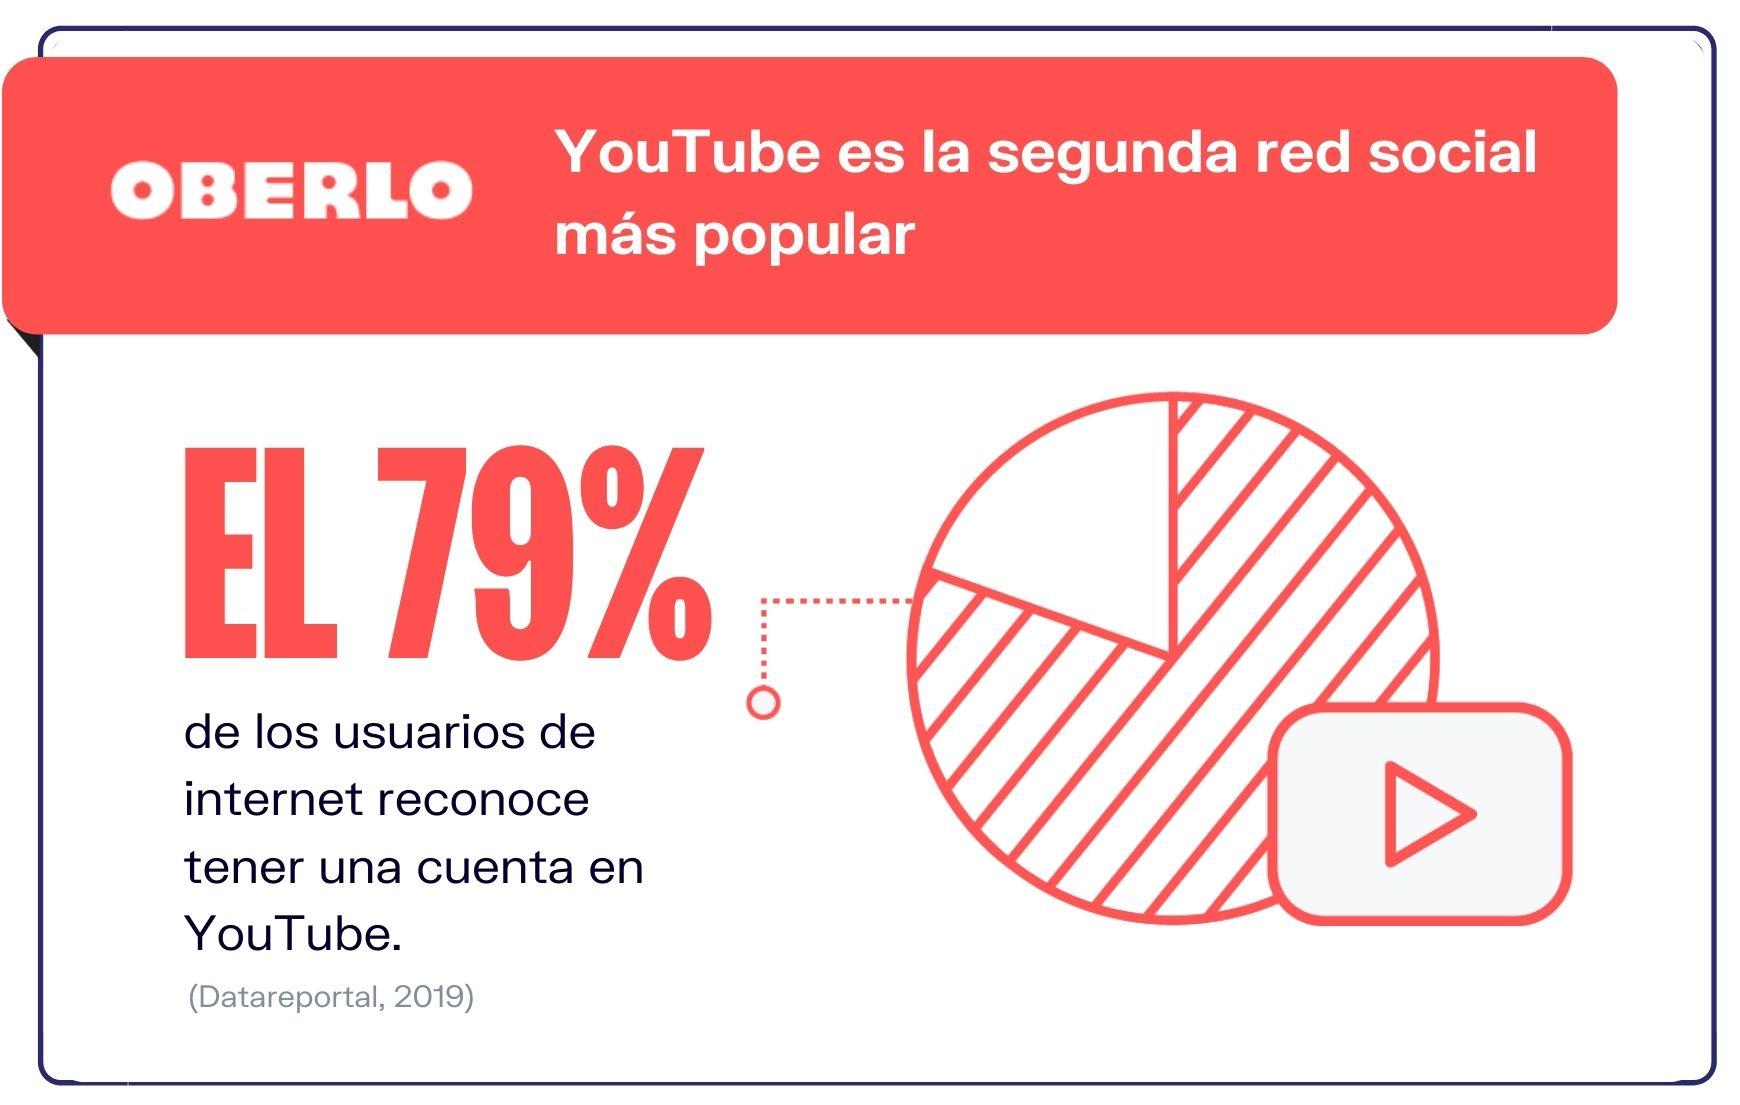 Estadisticas-YouTube-2da-plataforma-de-redes-sociales-mas-popular